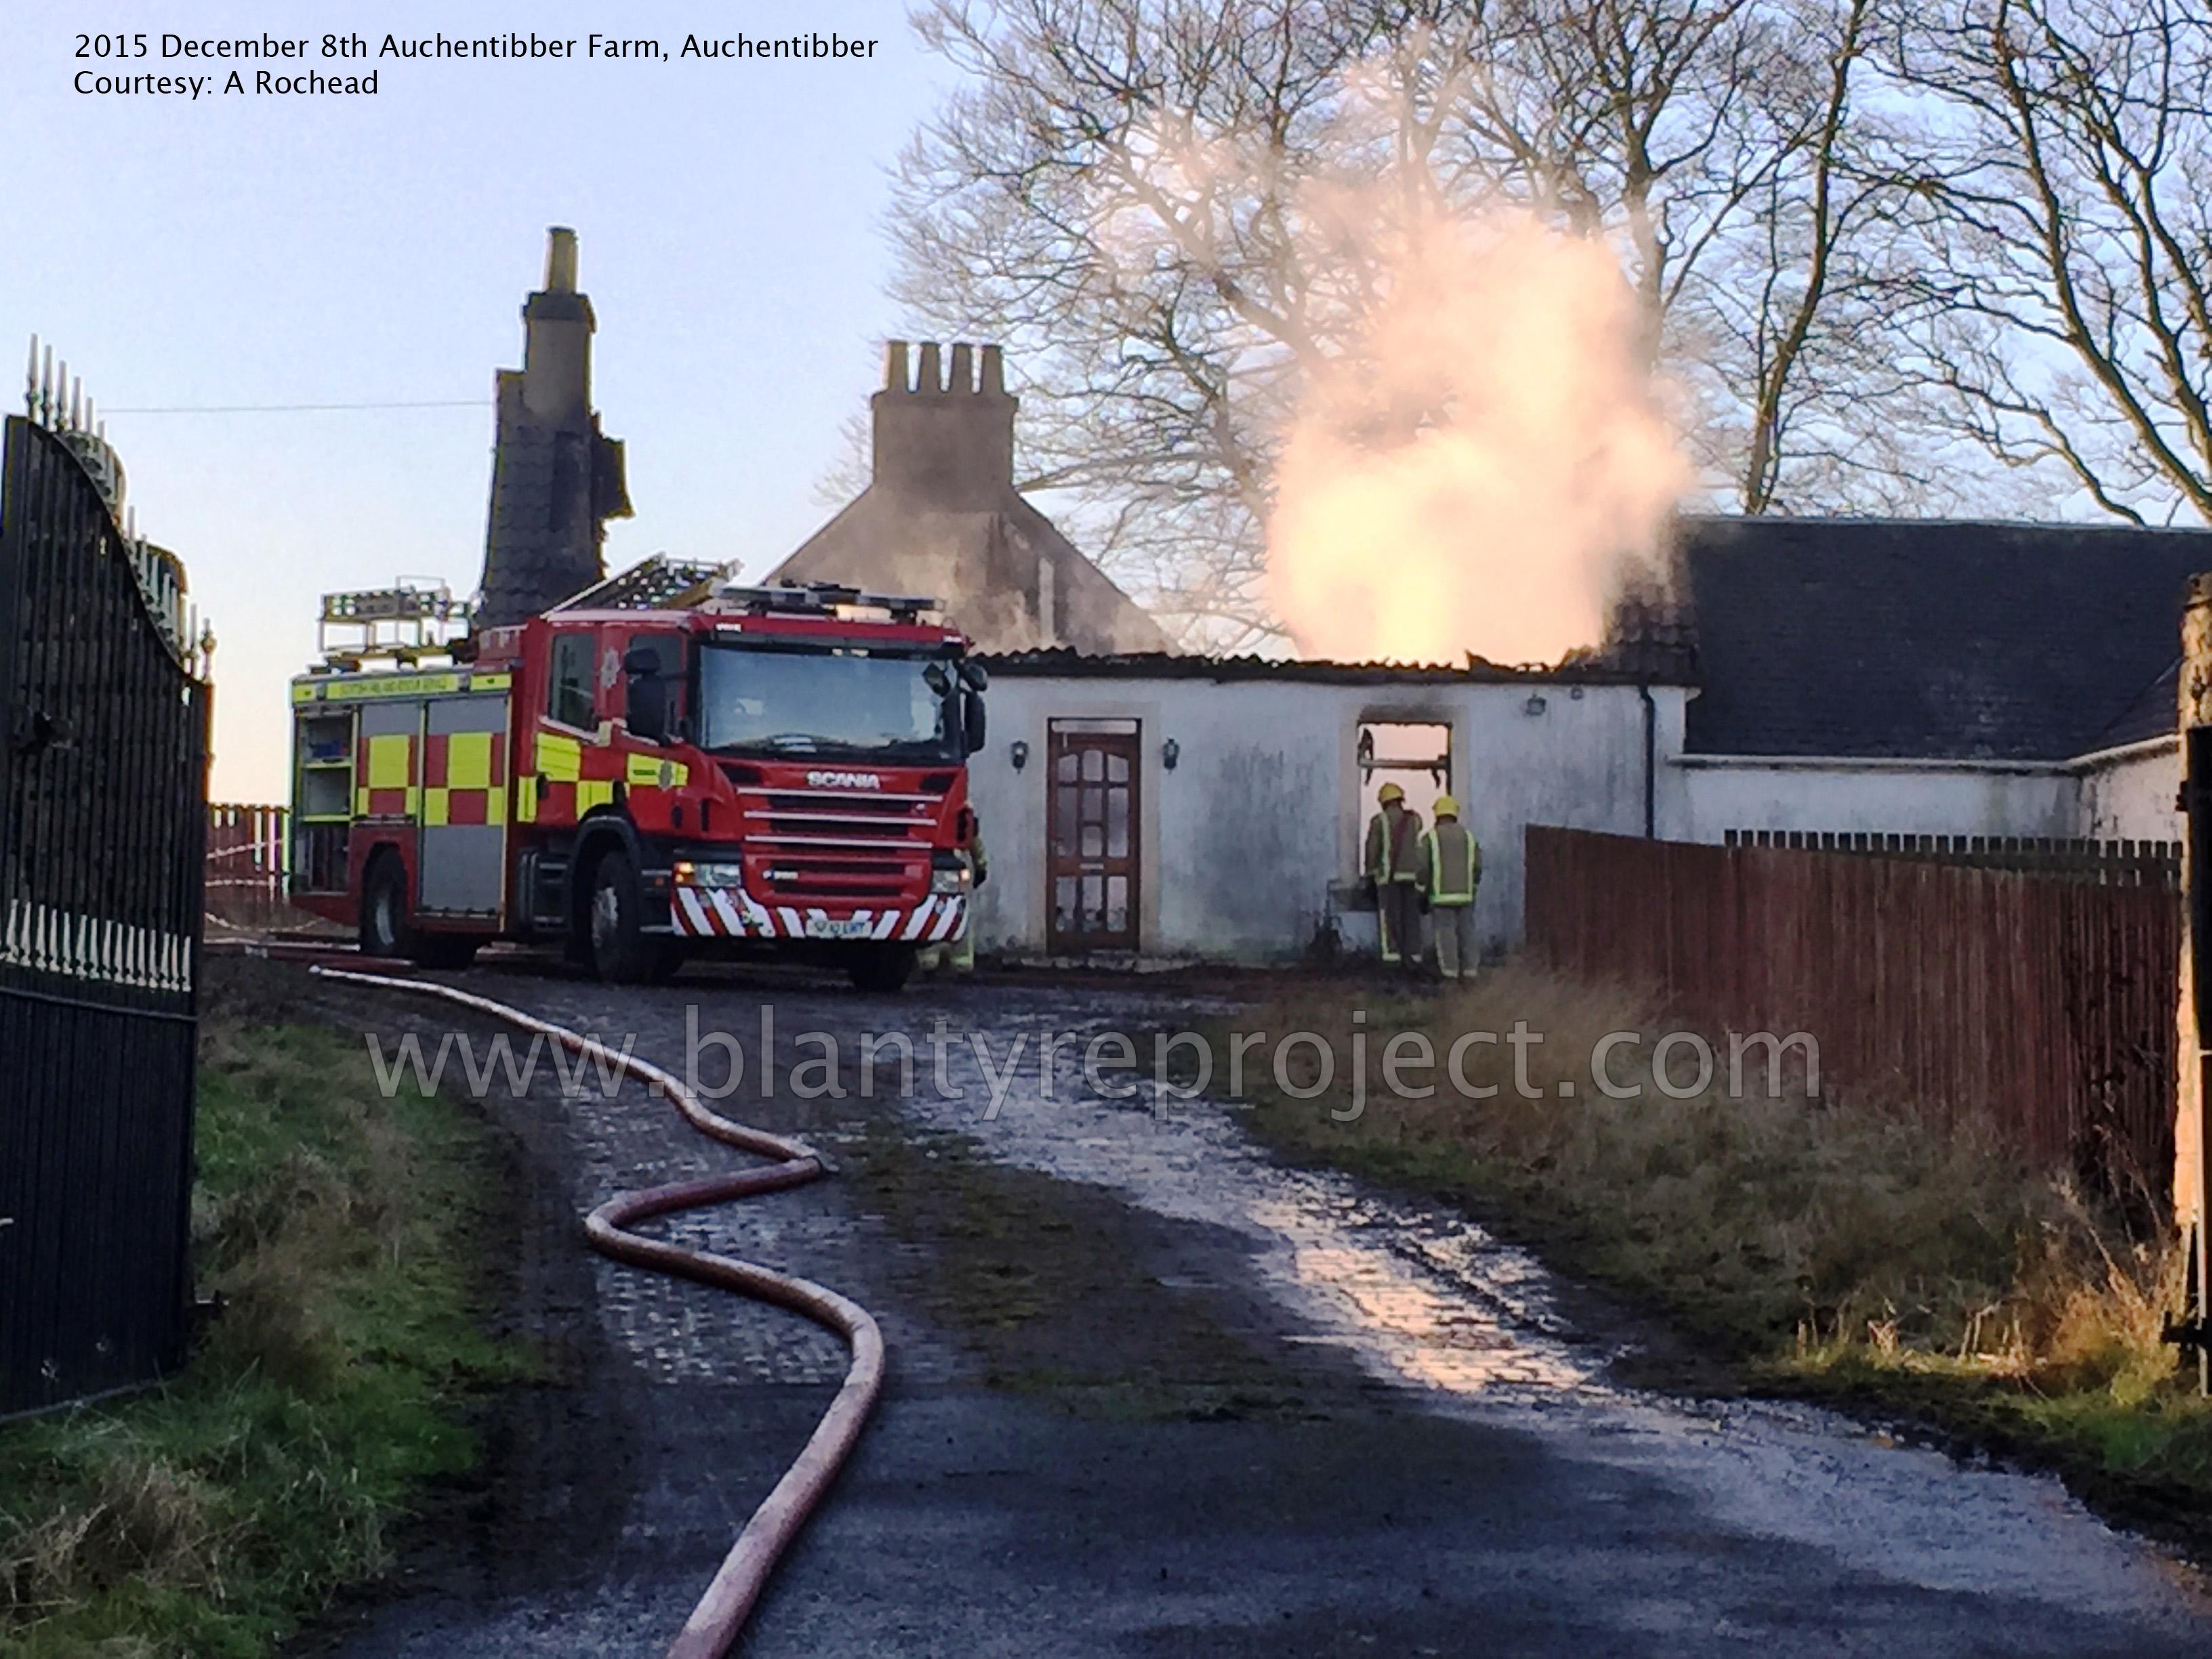 2015 Auchentibber Farm on Fire